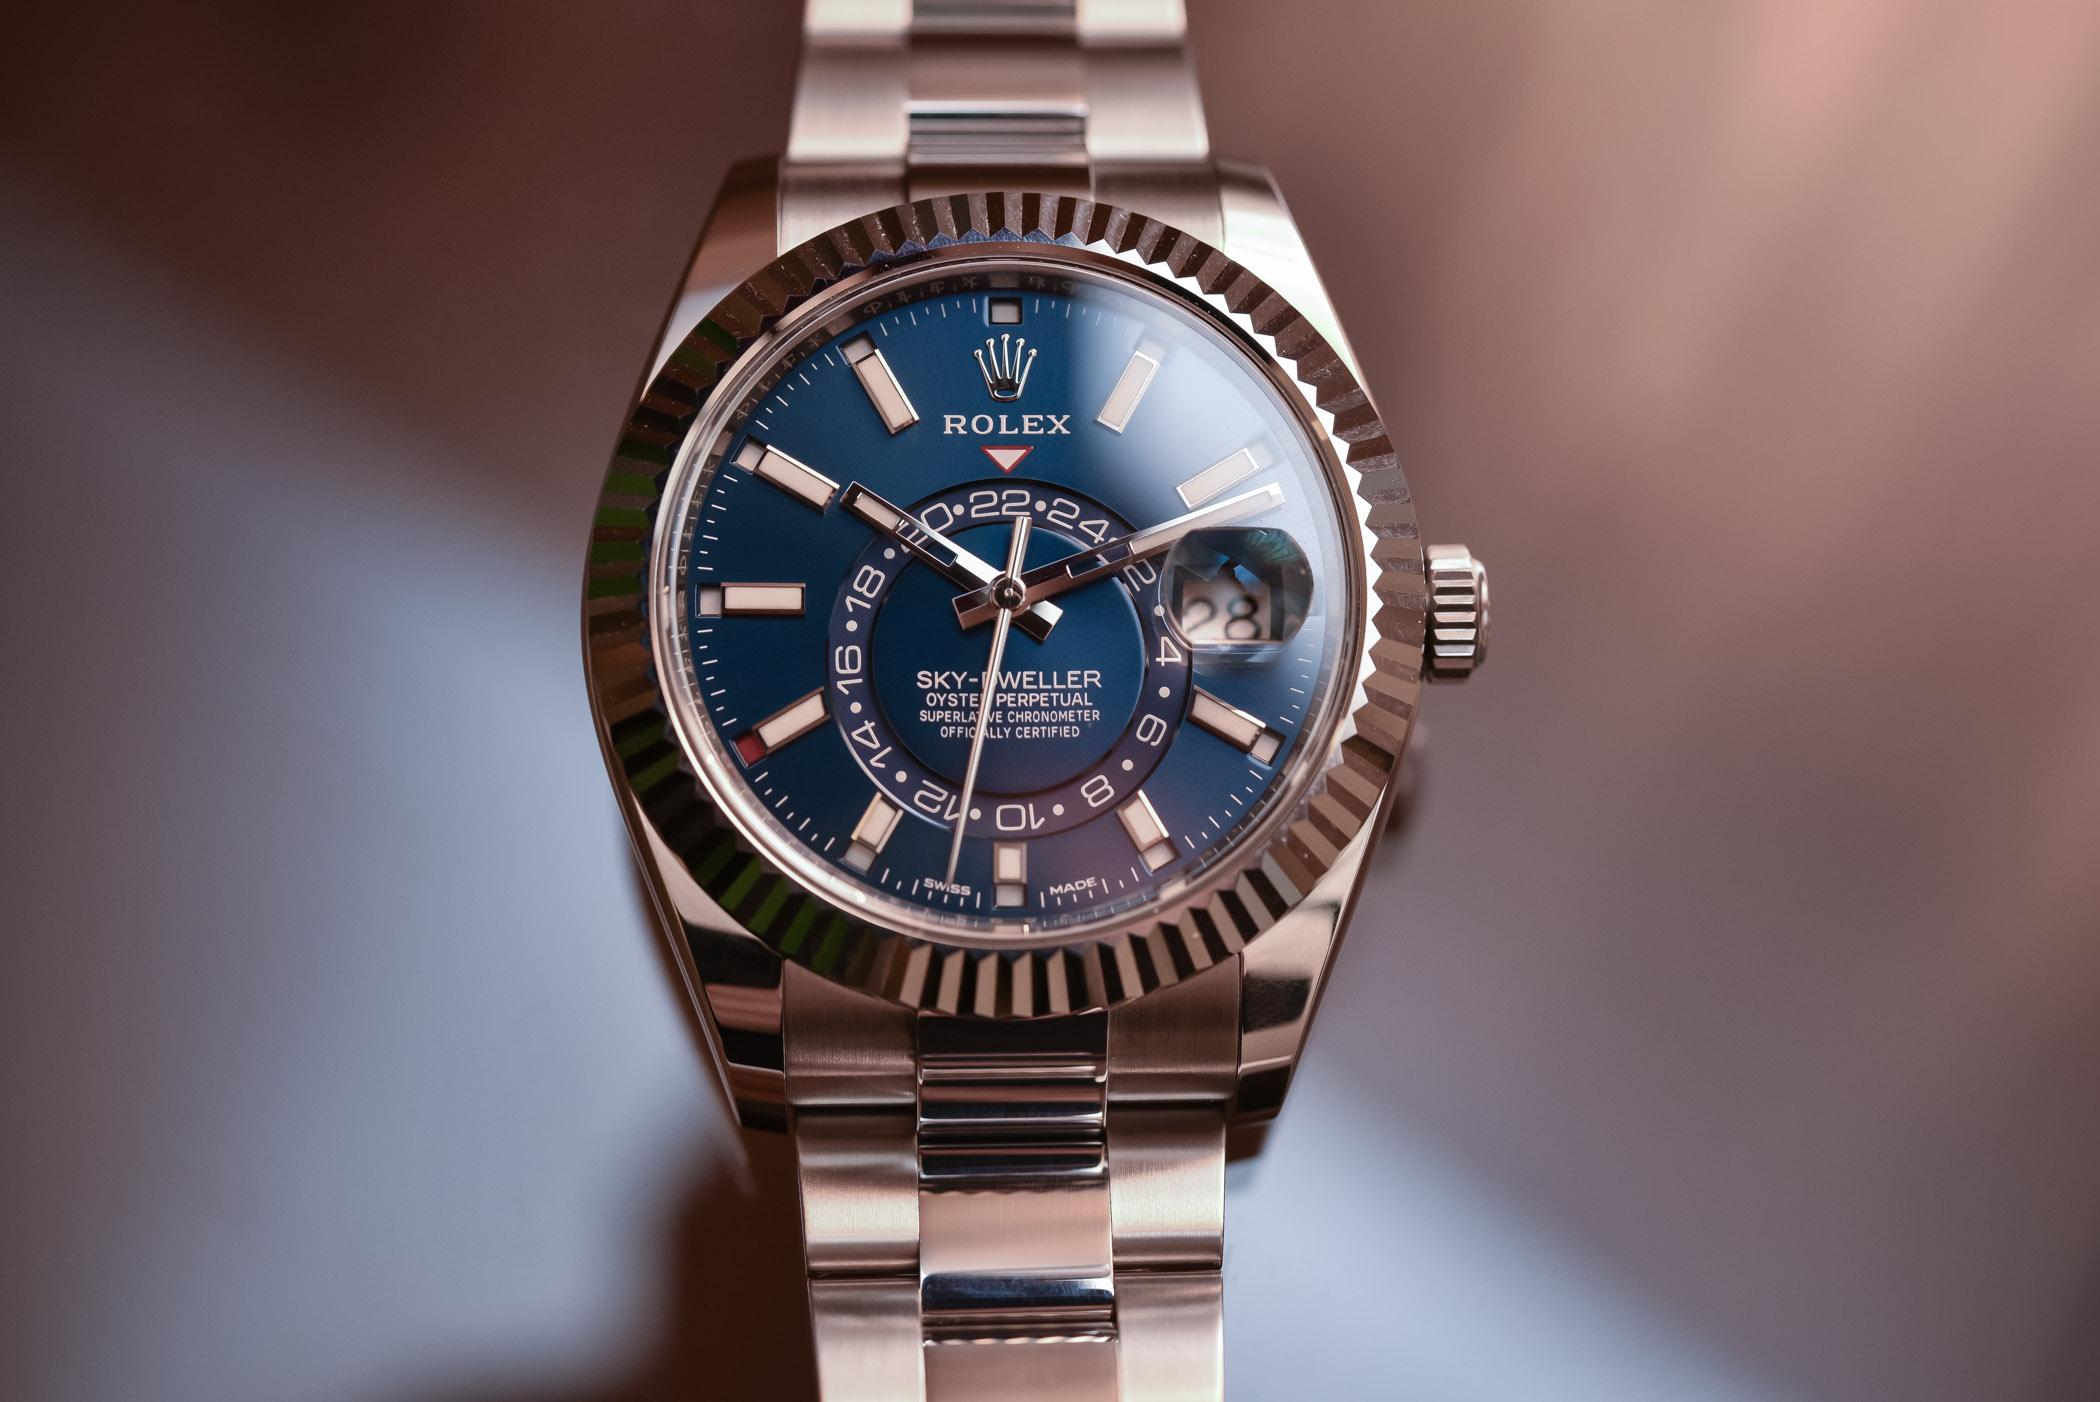 402d310e664 Rolex Sky-Dweller Steel 326934   Two-Tone 326933 - Review (Specs ...